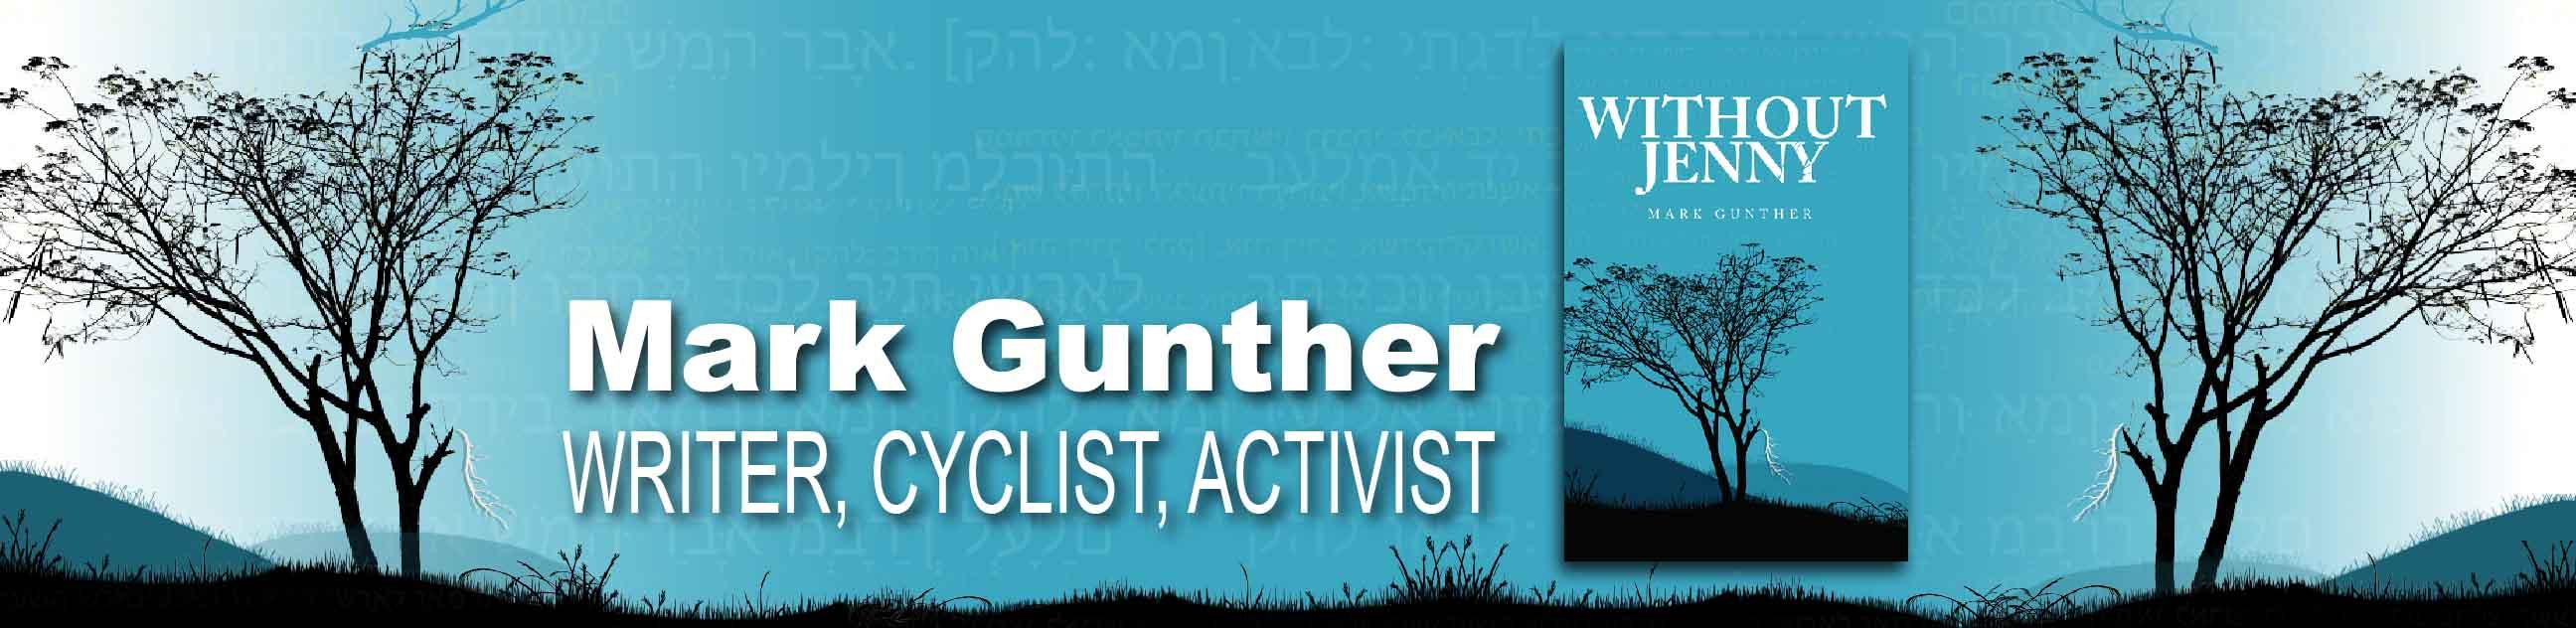 Mark Gunther